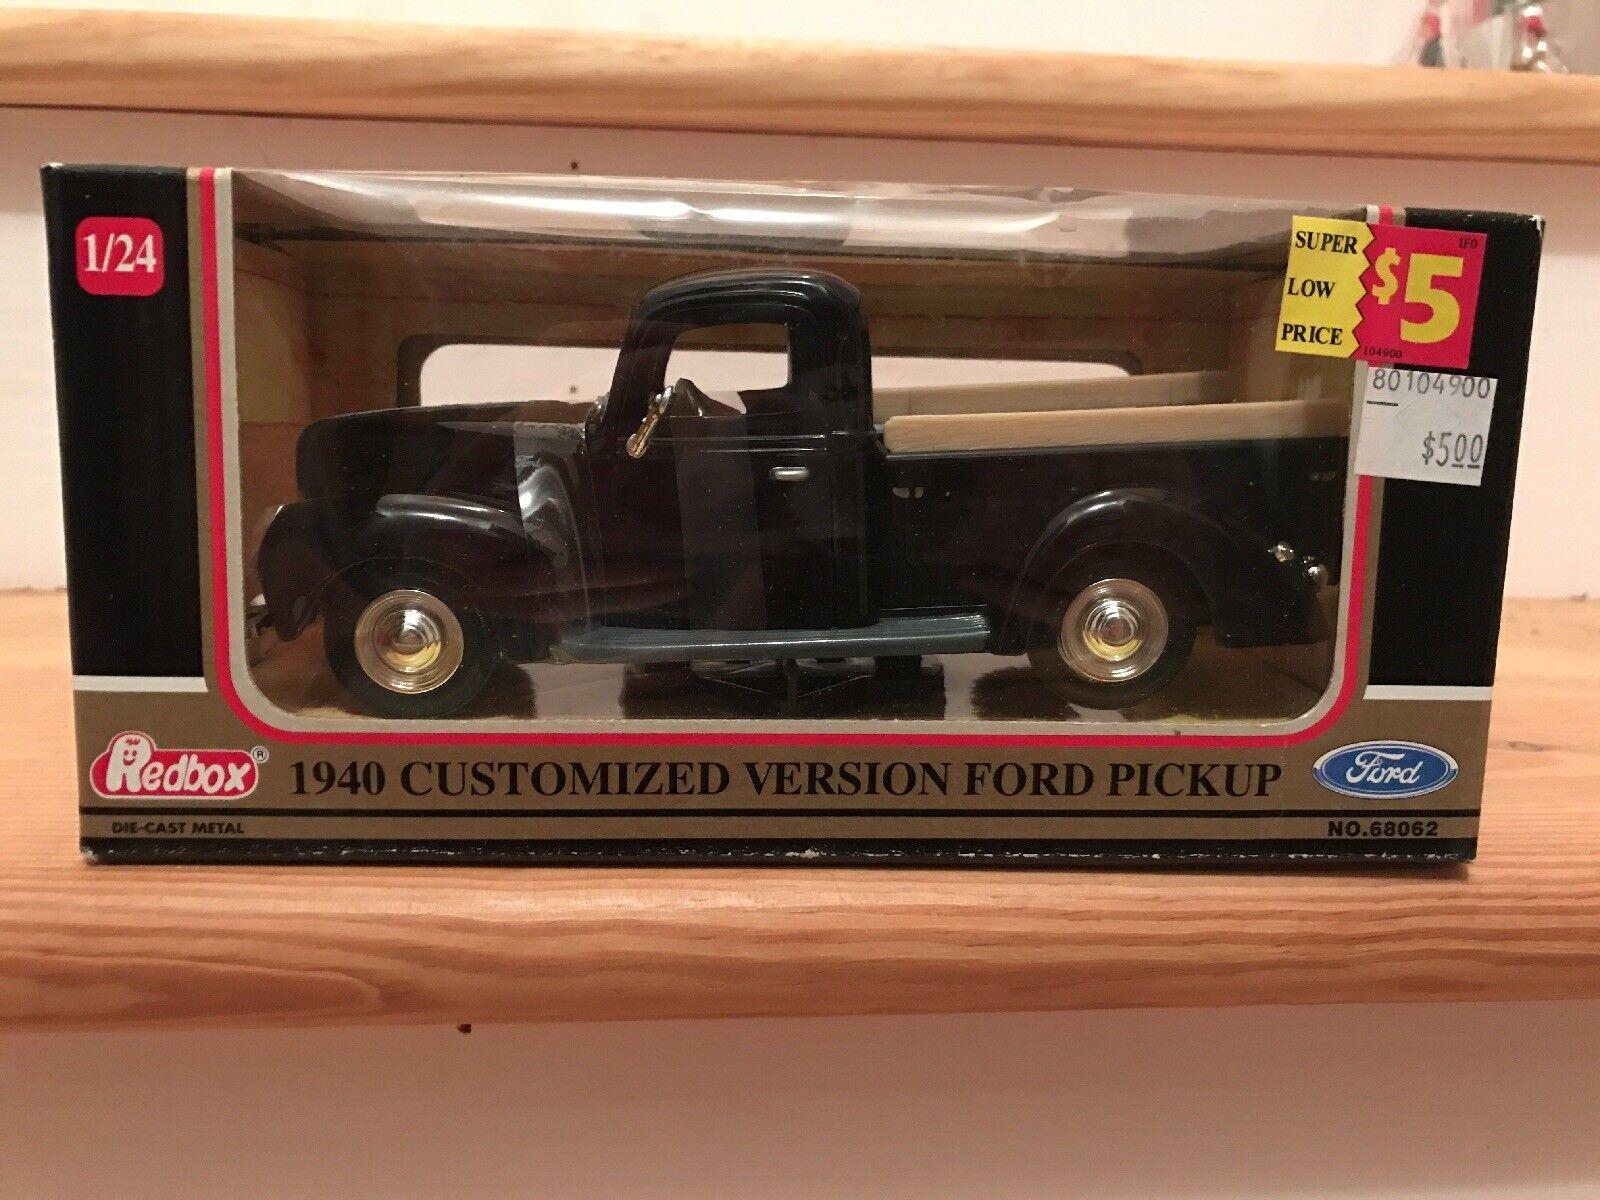 Redbox 1940 Ford Pickup Truck 68062 1 24 Die Cast Collector Model 1948 S Car Ebay